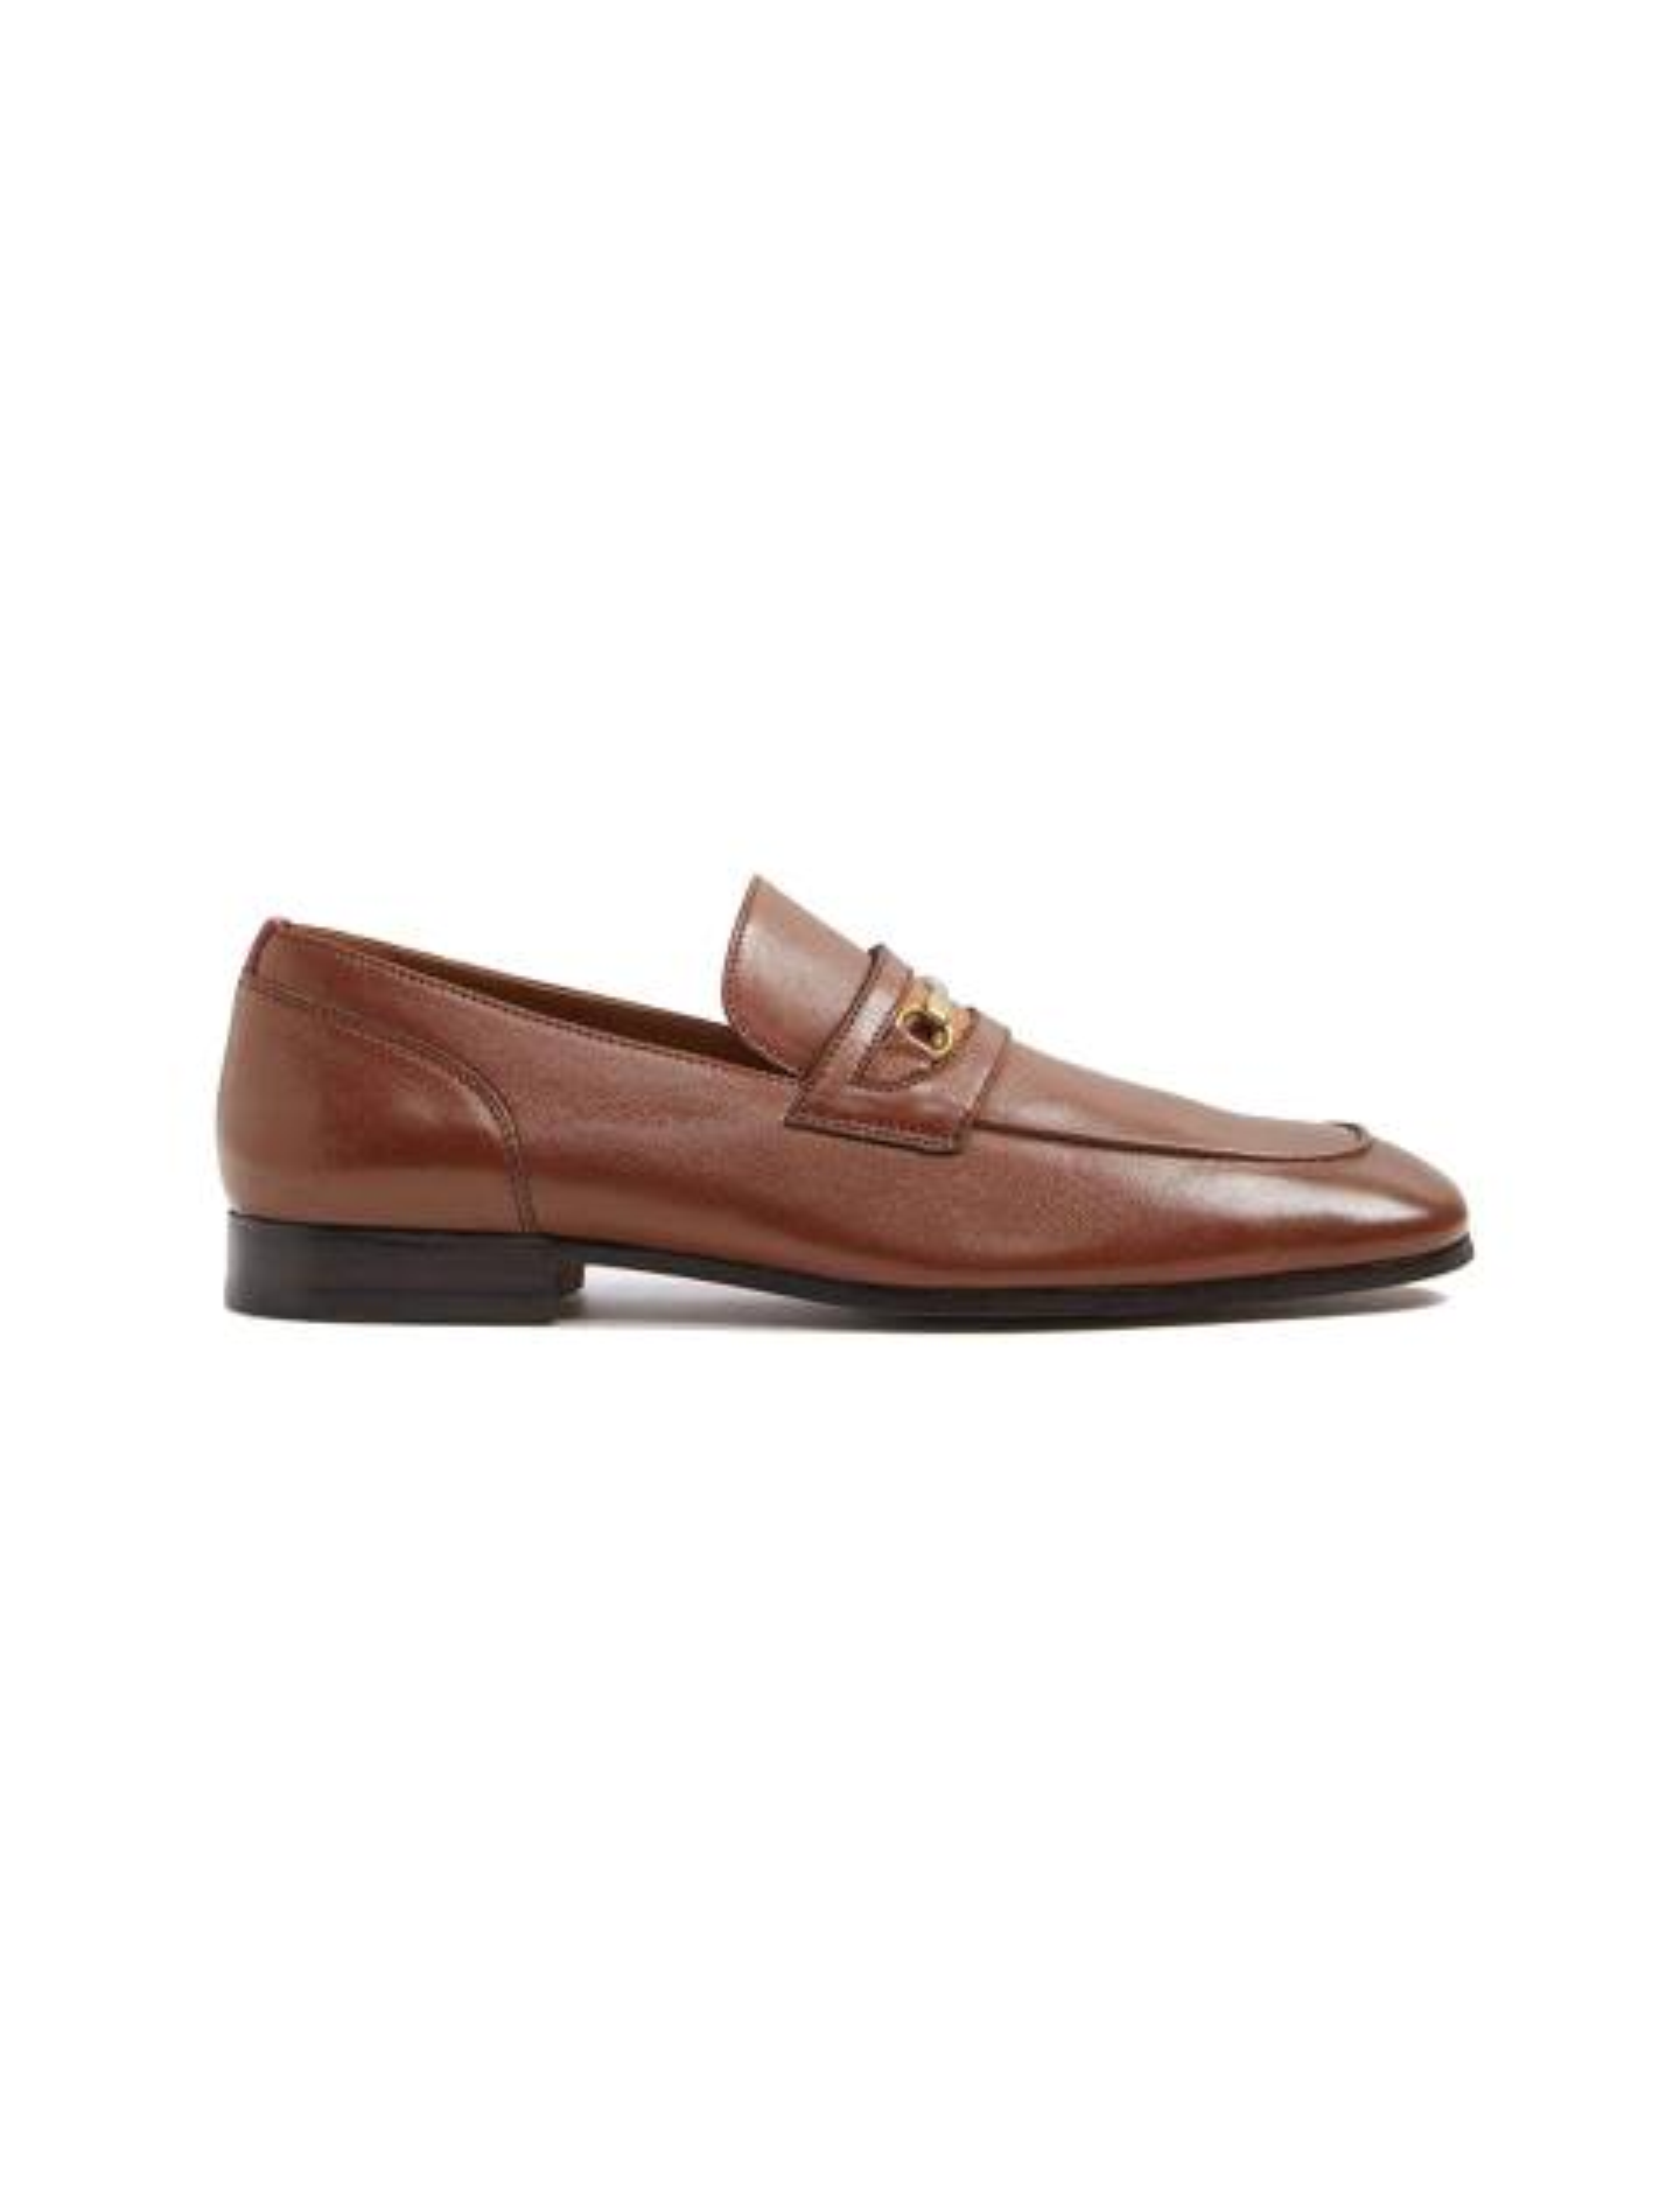 کفش اداری چرم مردانه - قهوه اي - 1